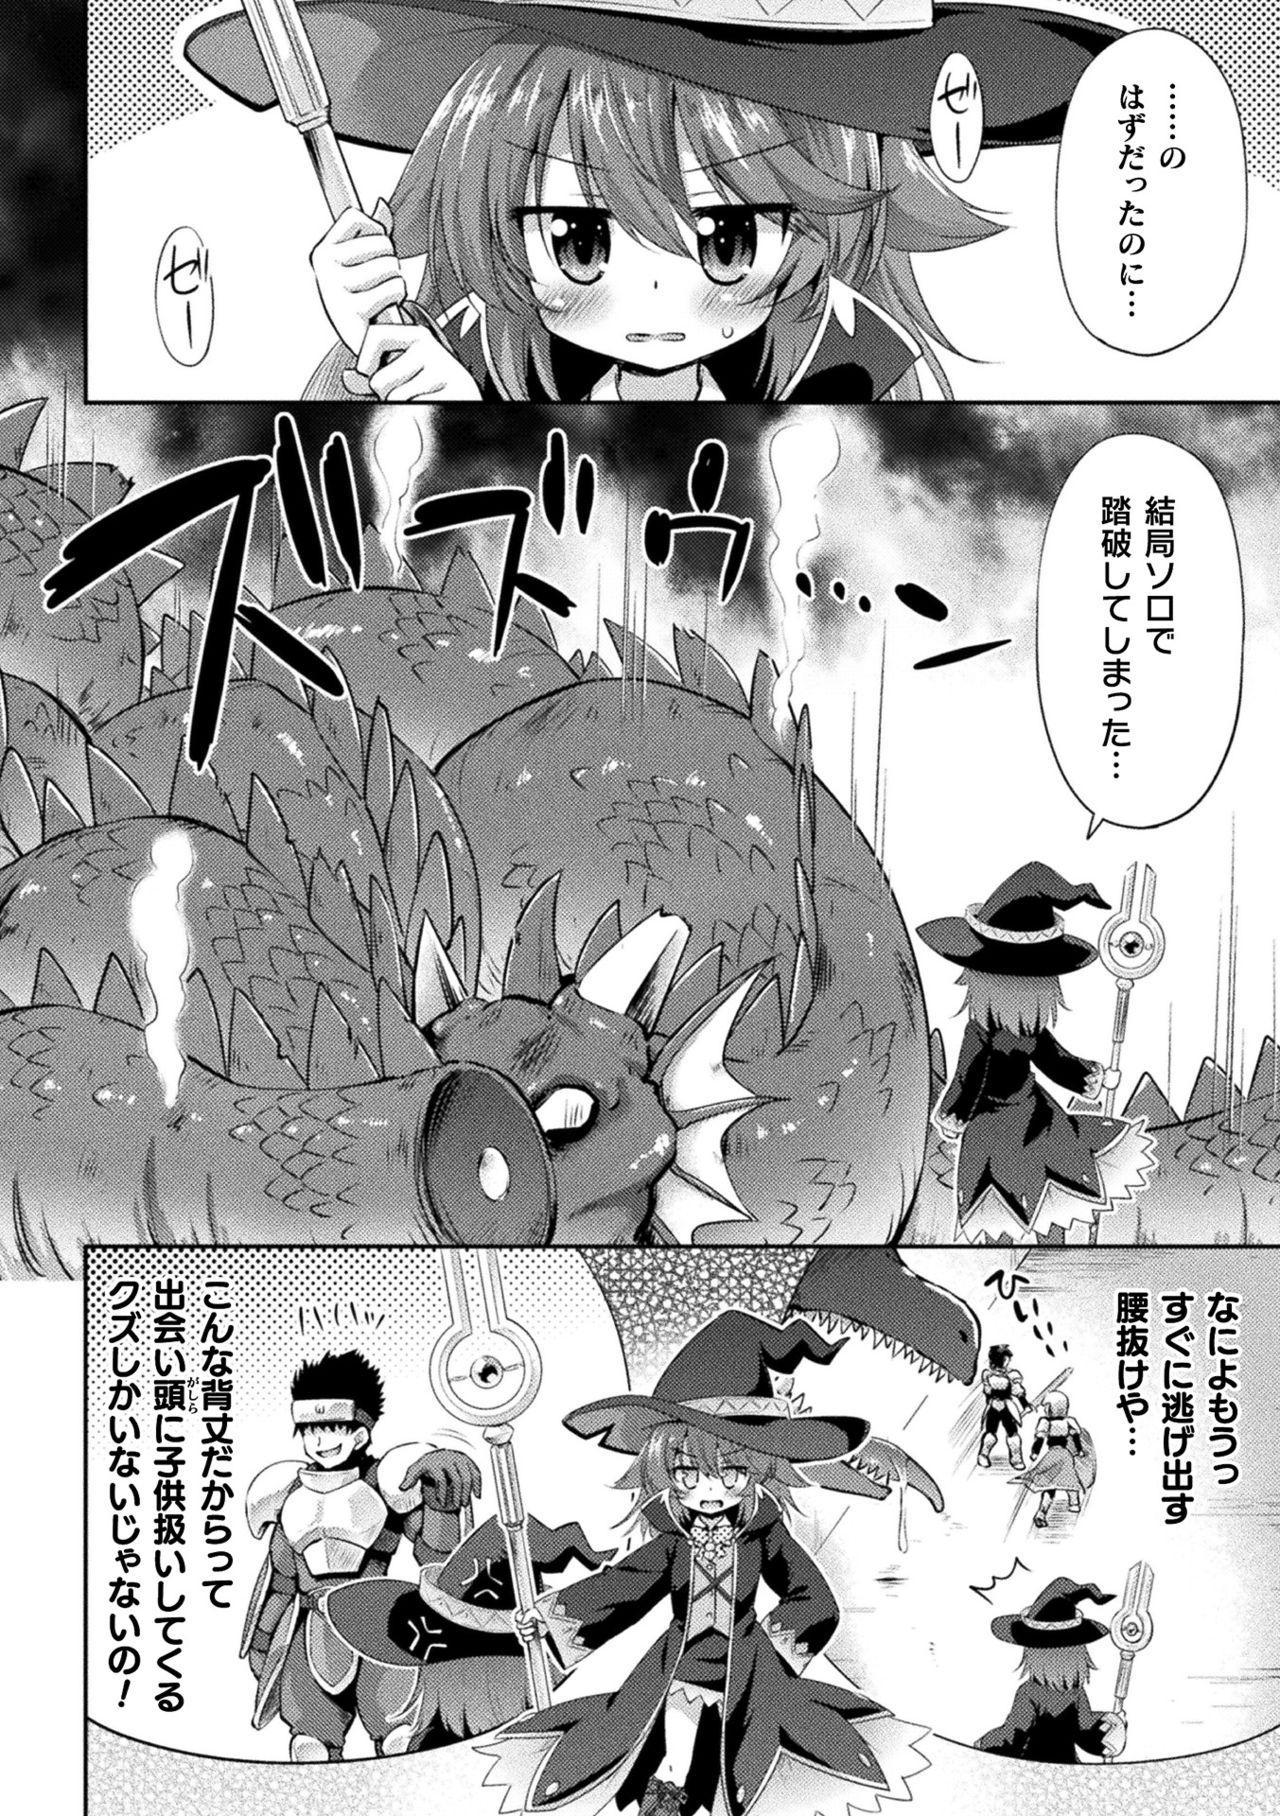 2D Comic Magazine - Syukusyouka Hiroin Kyousei Onahole Keikaku Vol. 2 59